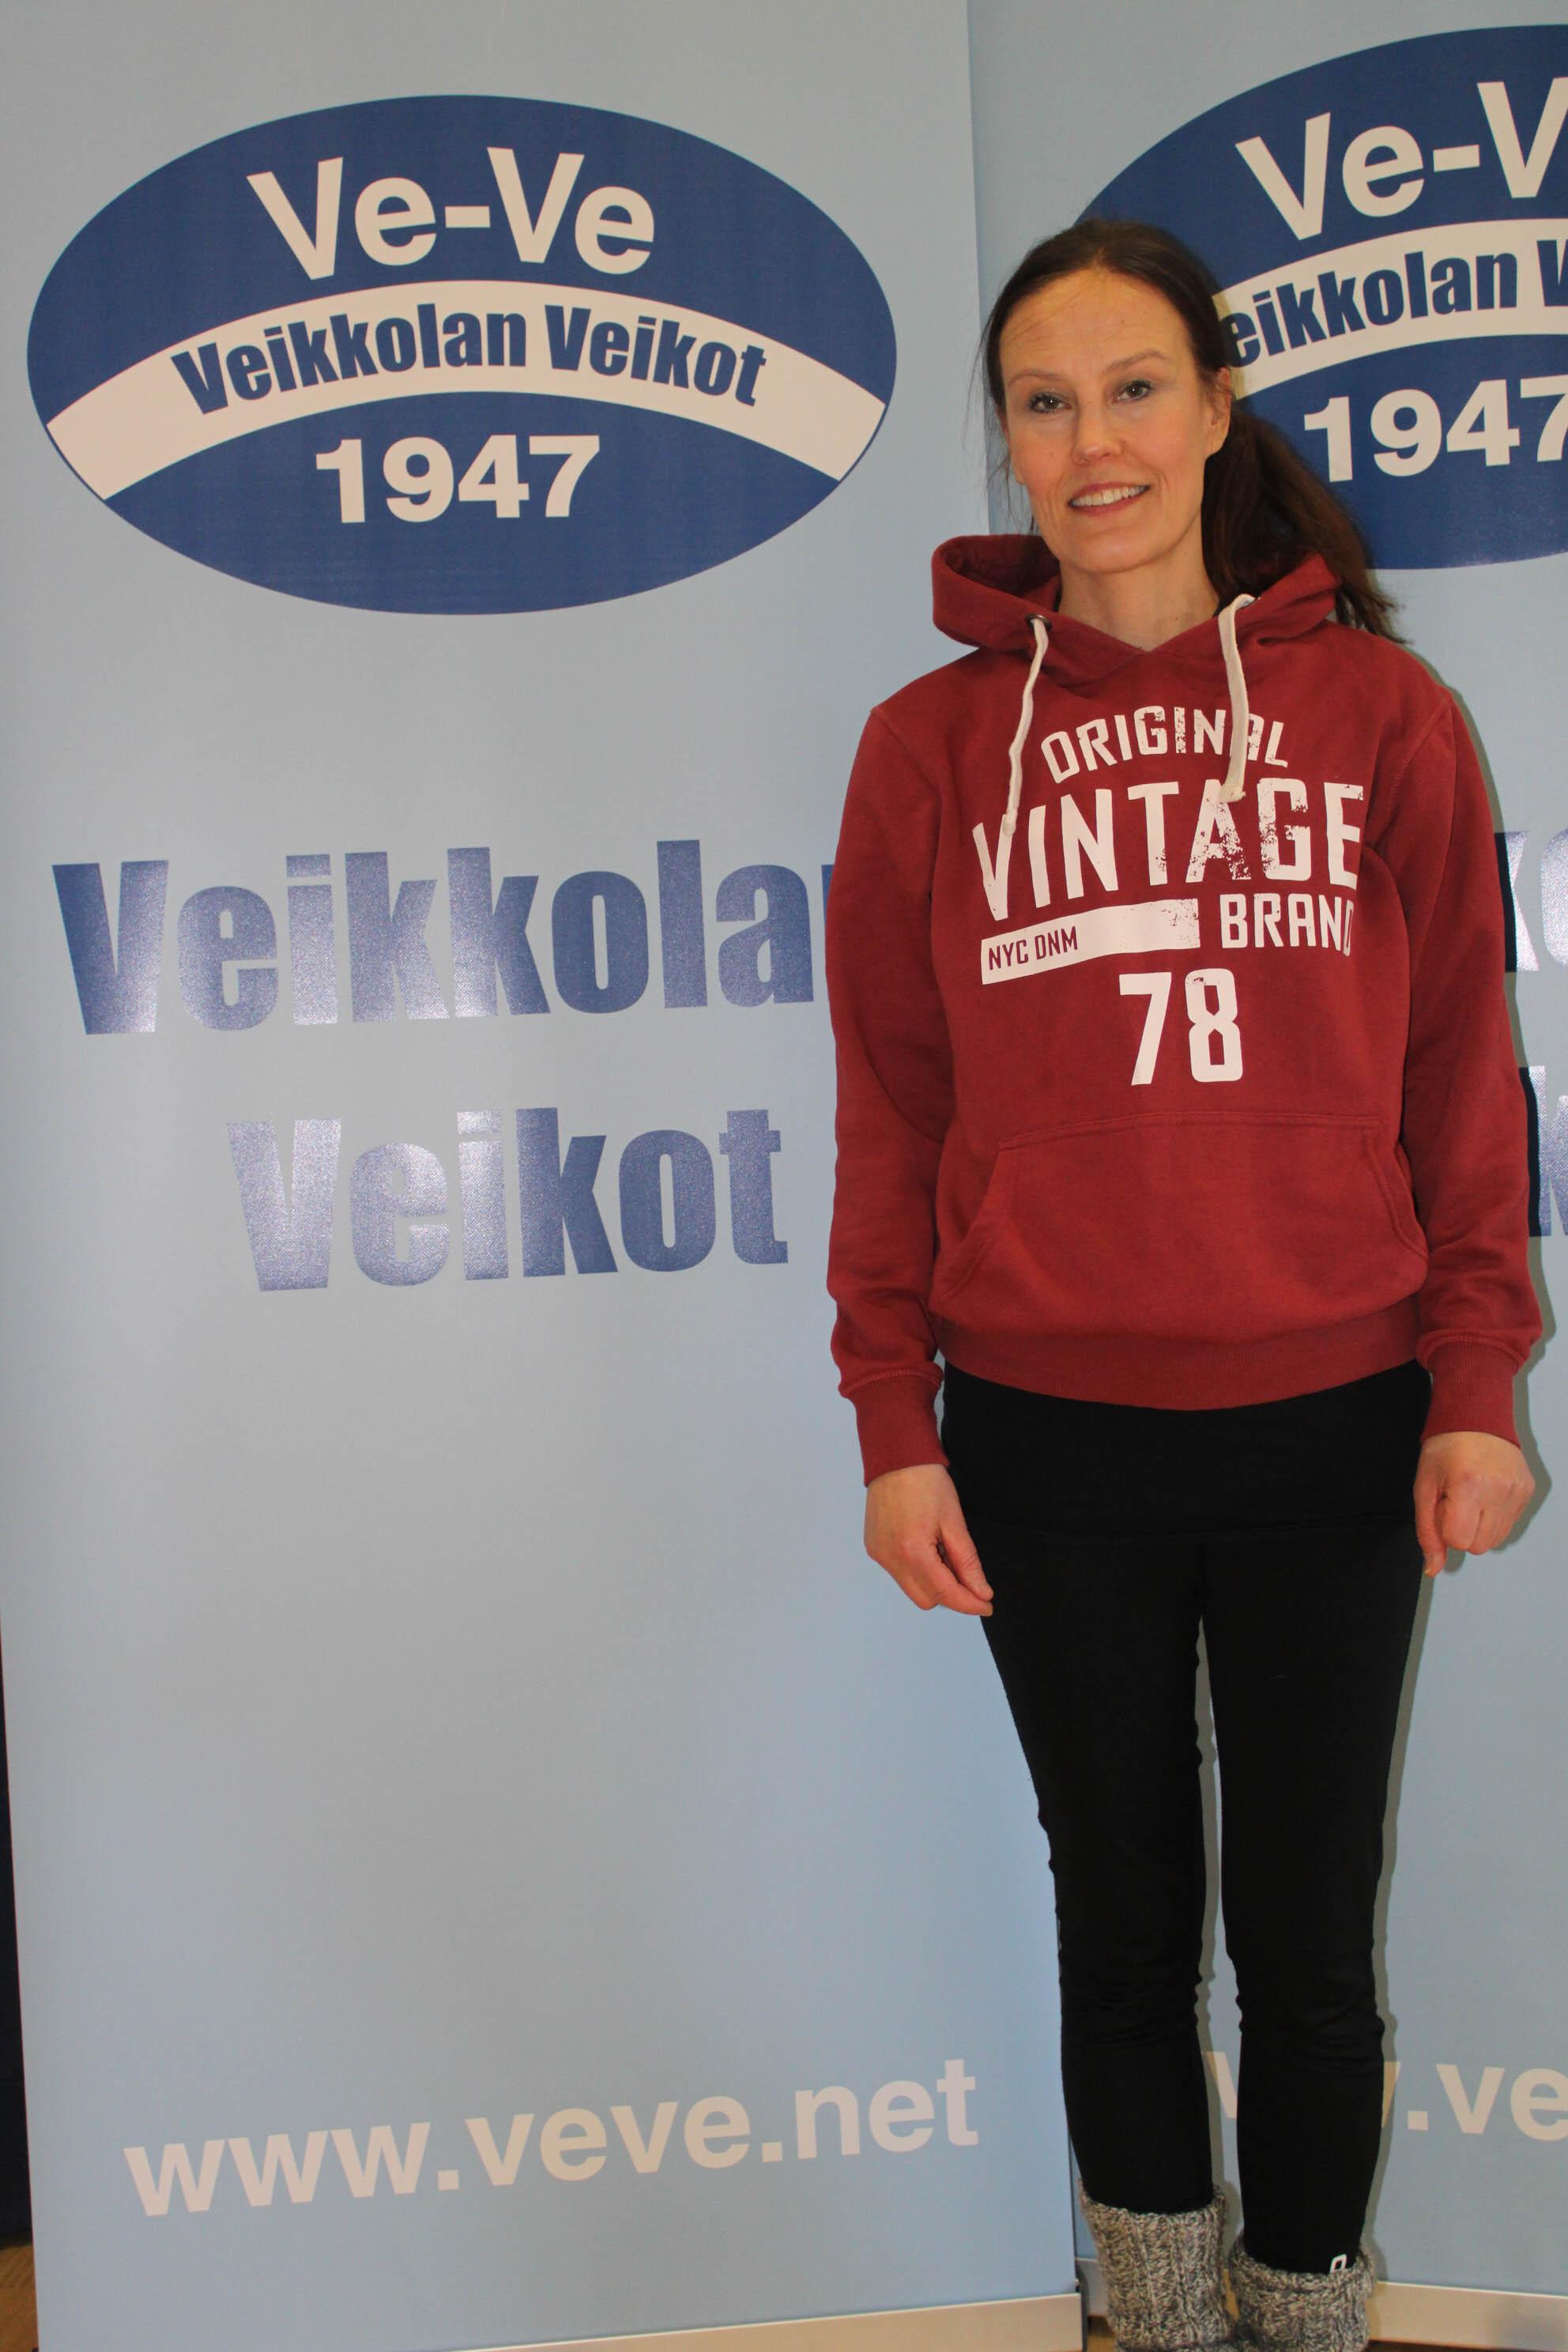 Marjukka Zohar